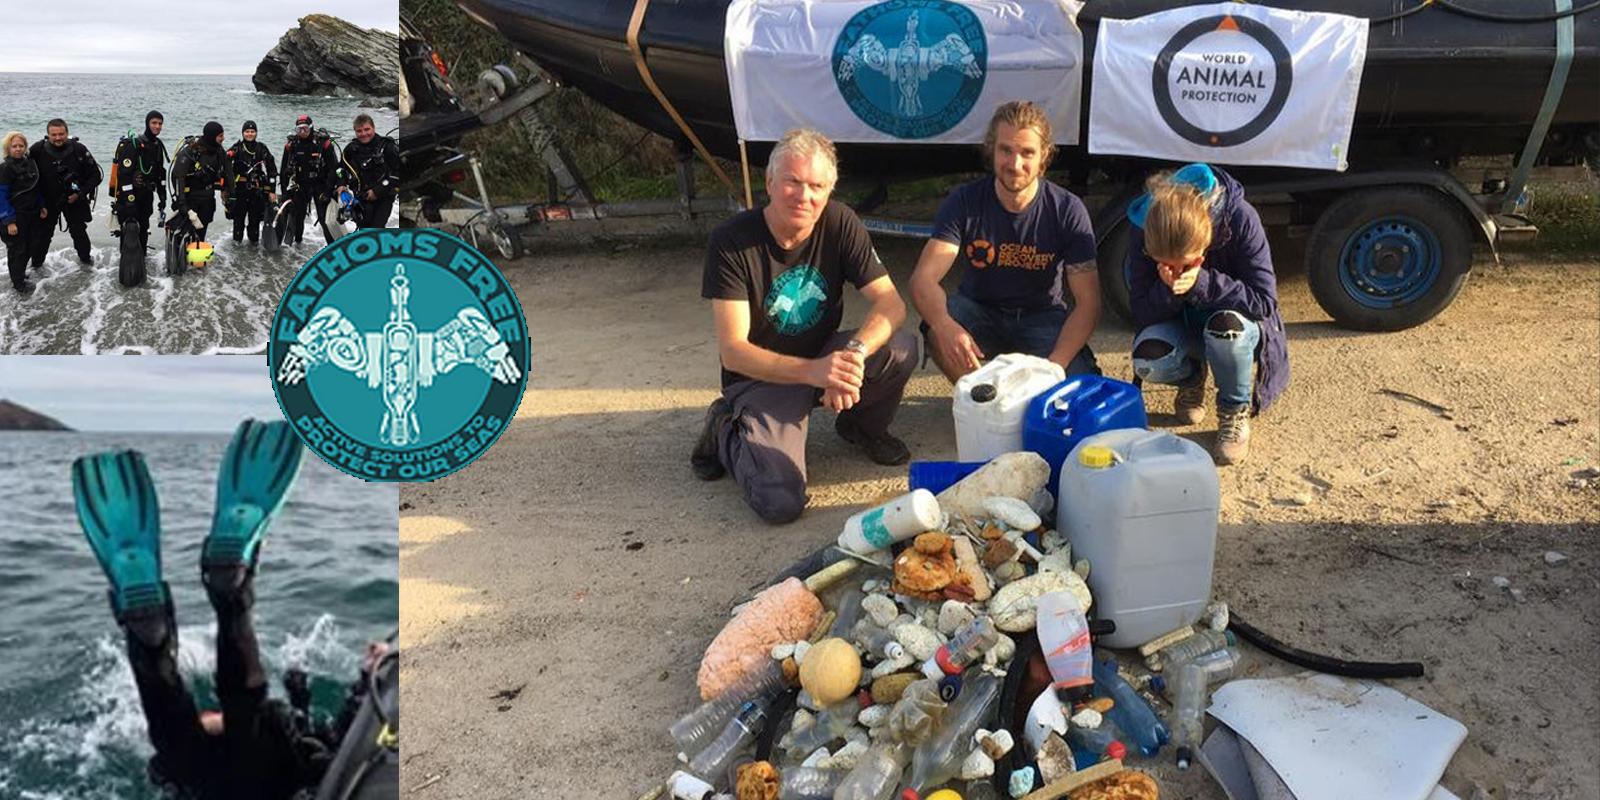 volunteer_divers_remove_plastic_from_sea